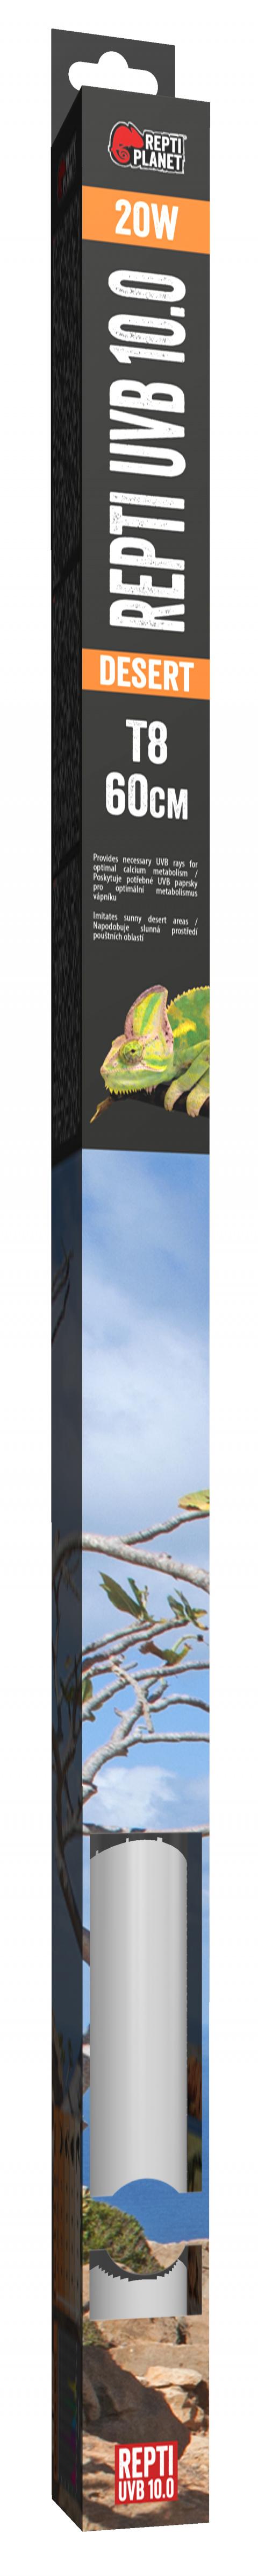 Лампа для террариумов - ReptiPlanet Repti T8 UVB 10.0 20W, 60 см title=